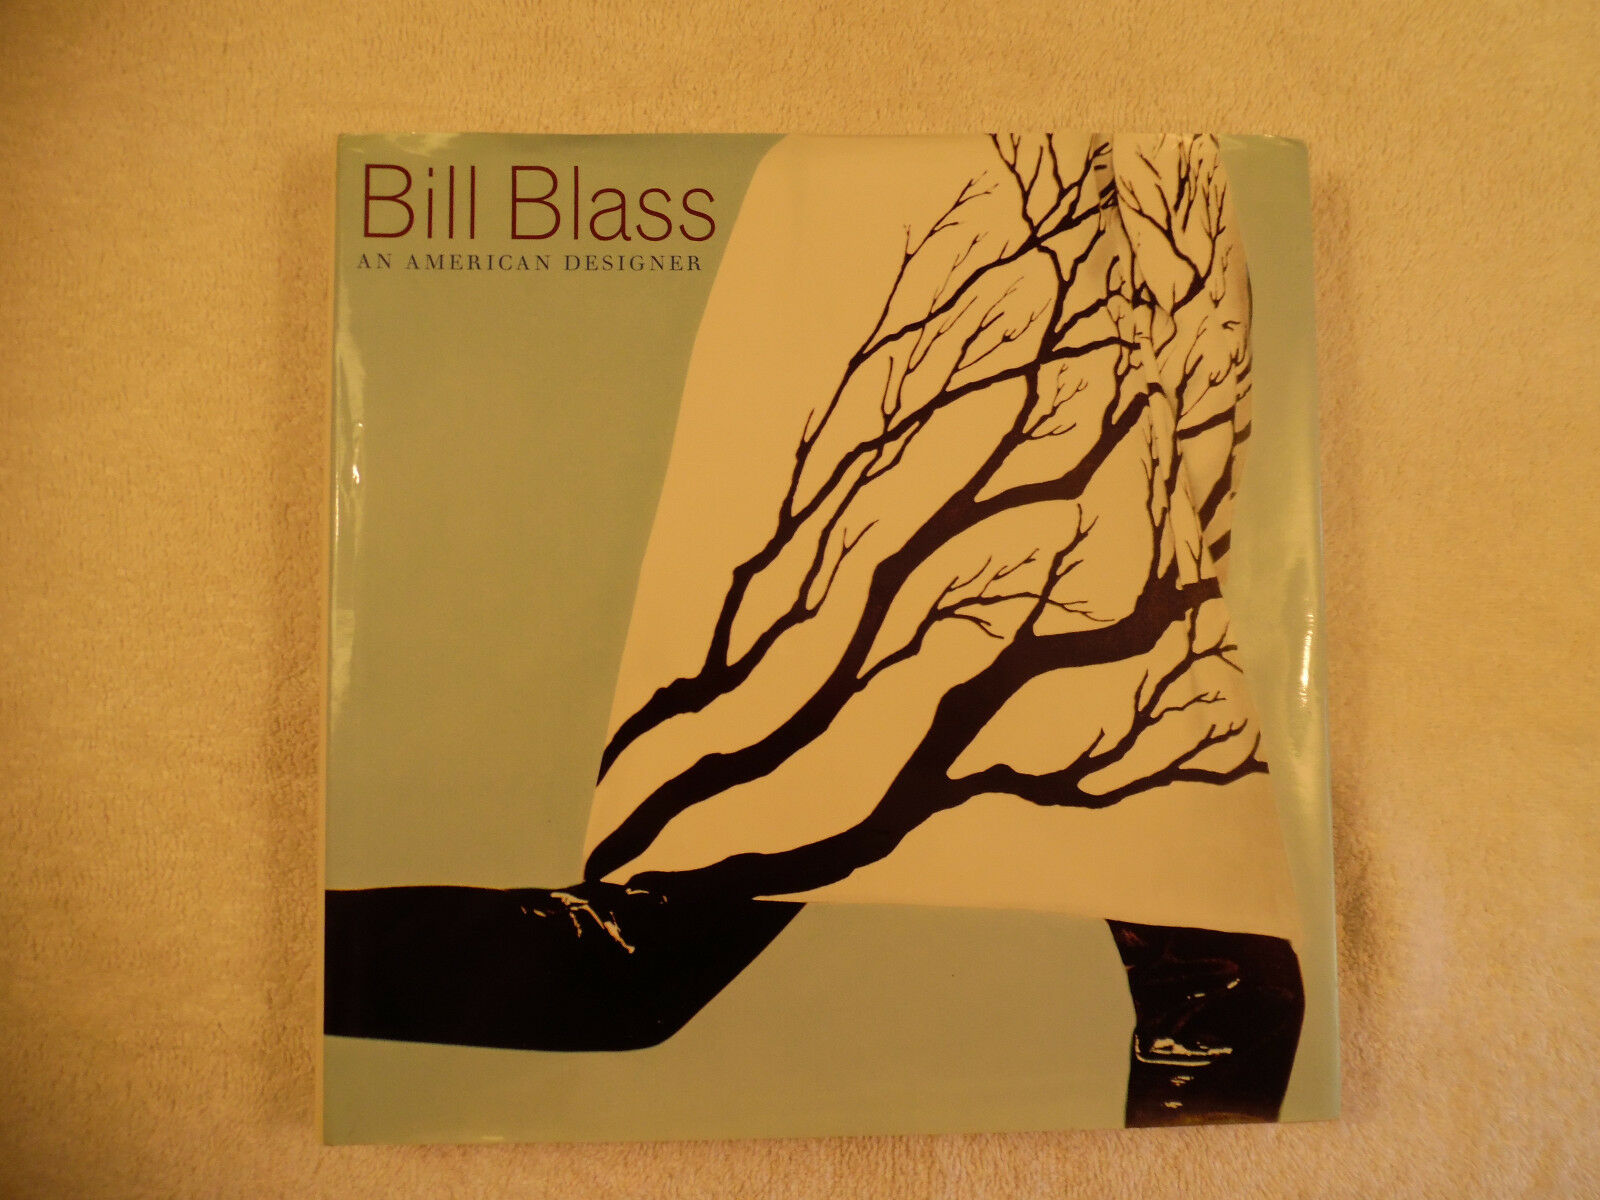 Bill Blass An American Designer Illustrated 2002 O'Hagan LN 160-15B